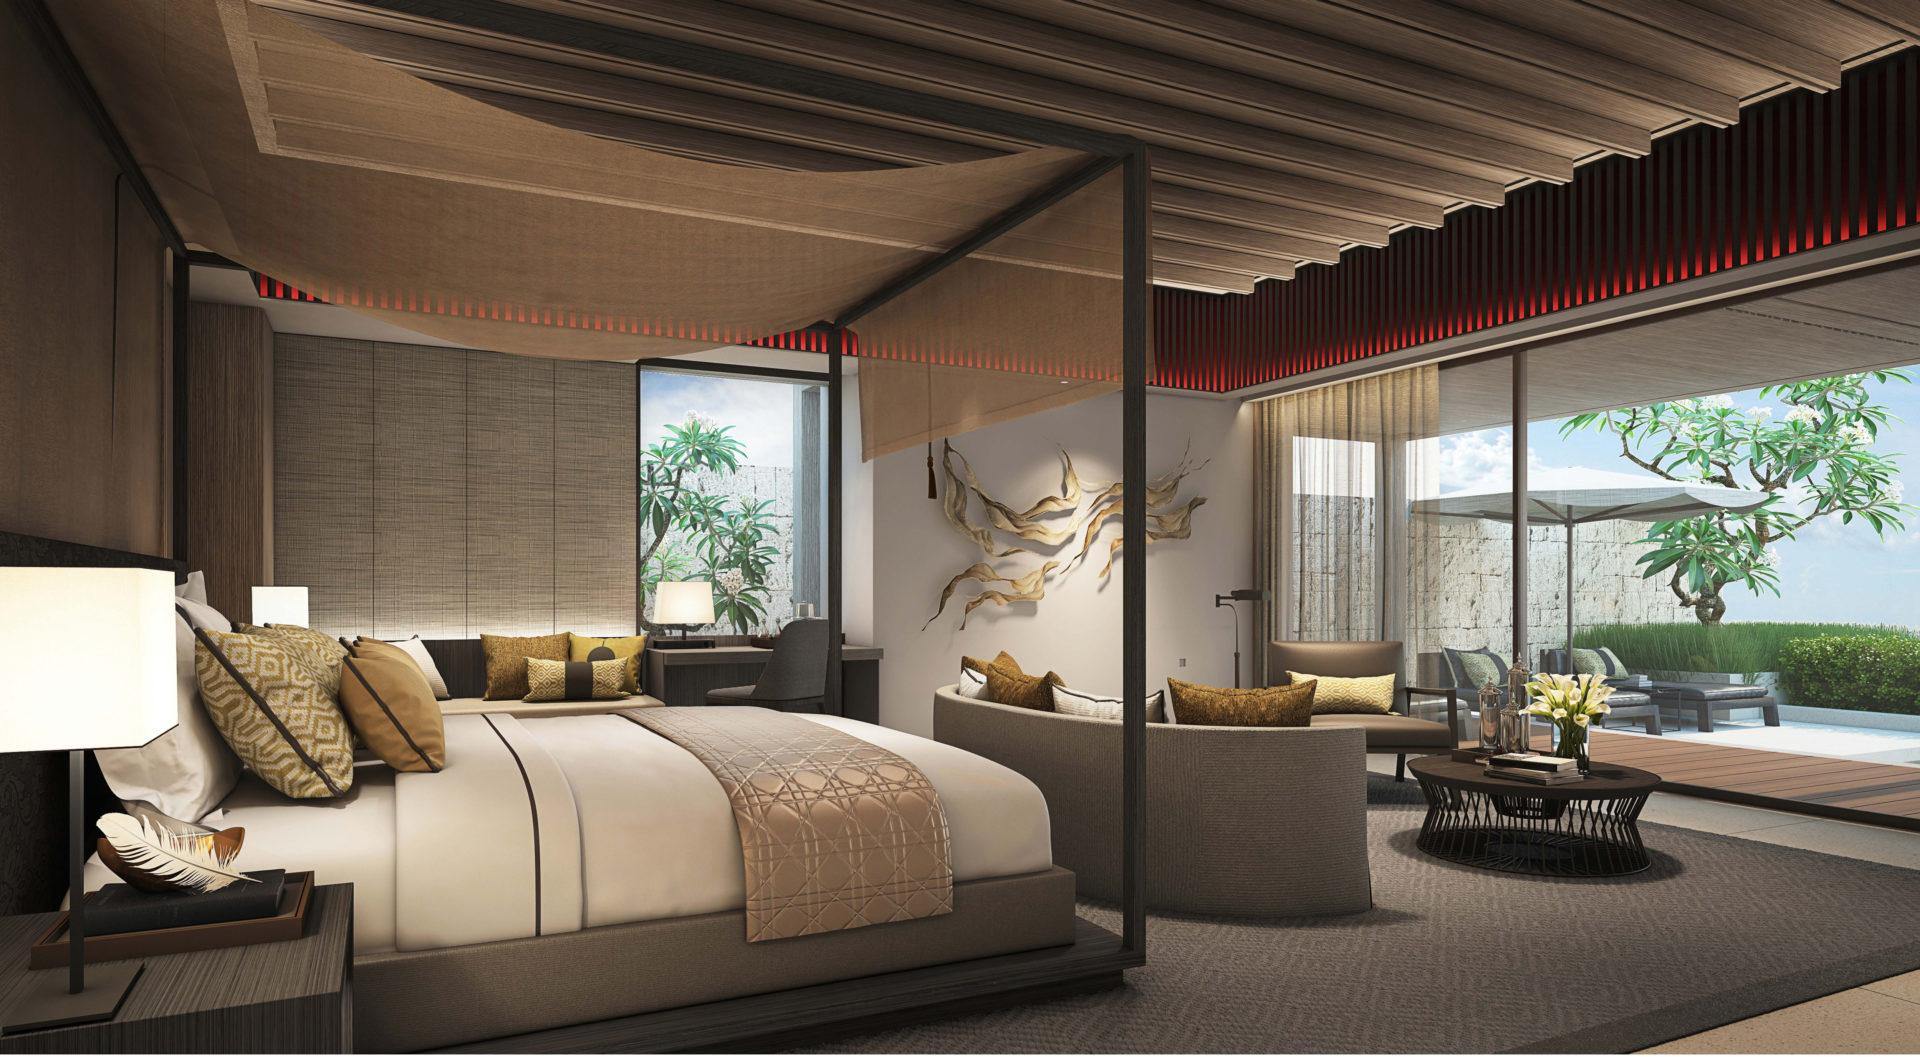 waldorf_astoria_indonesia_bali_villa_bedroom